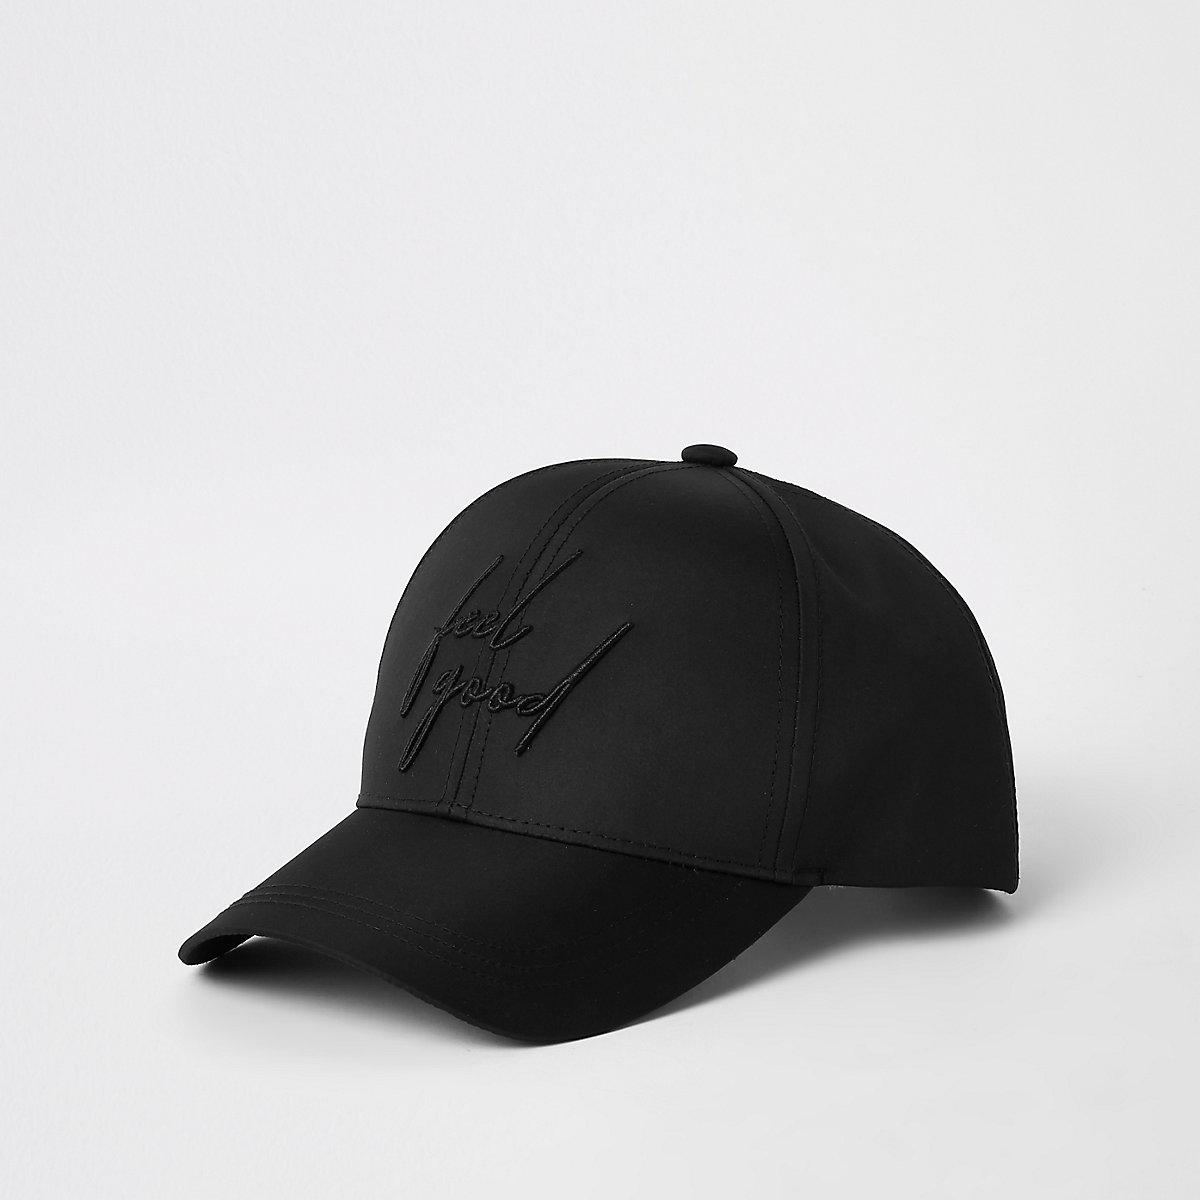 Black 'feel good' baseball cap